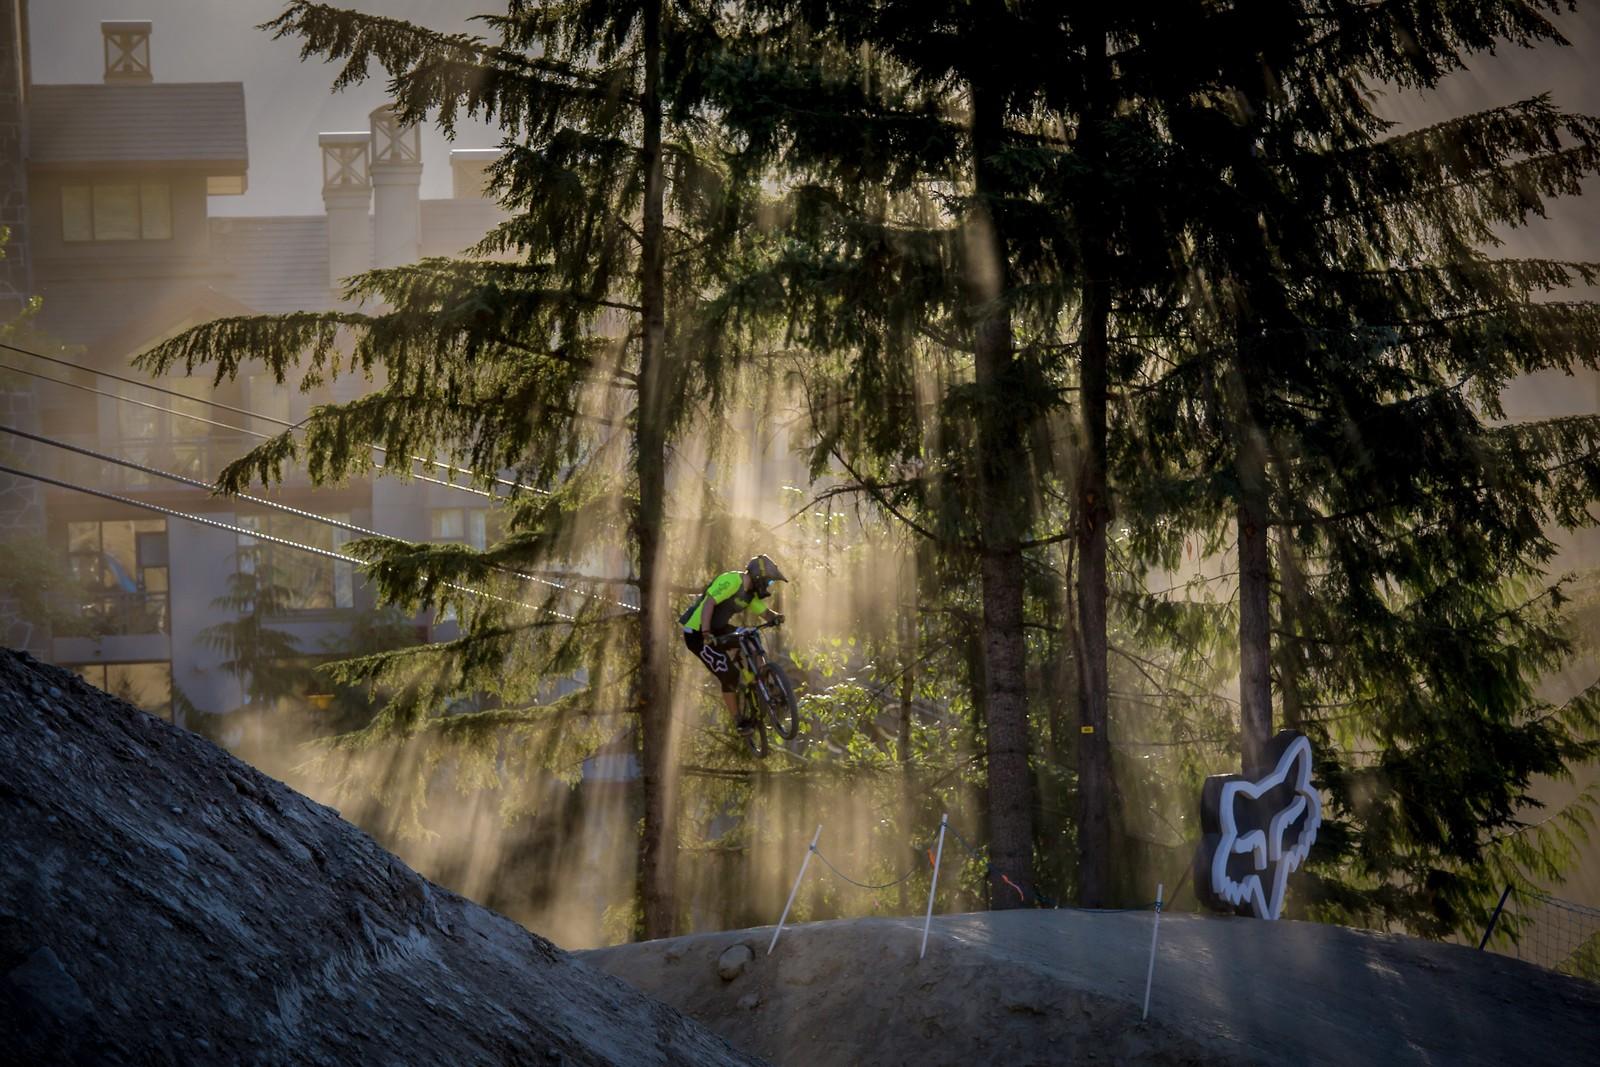 World bike day - Malcolm Mclaws - Mountain Biking Pictures - Vital MTB